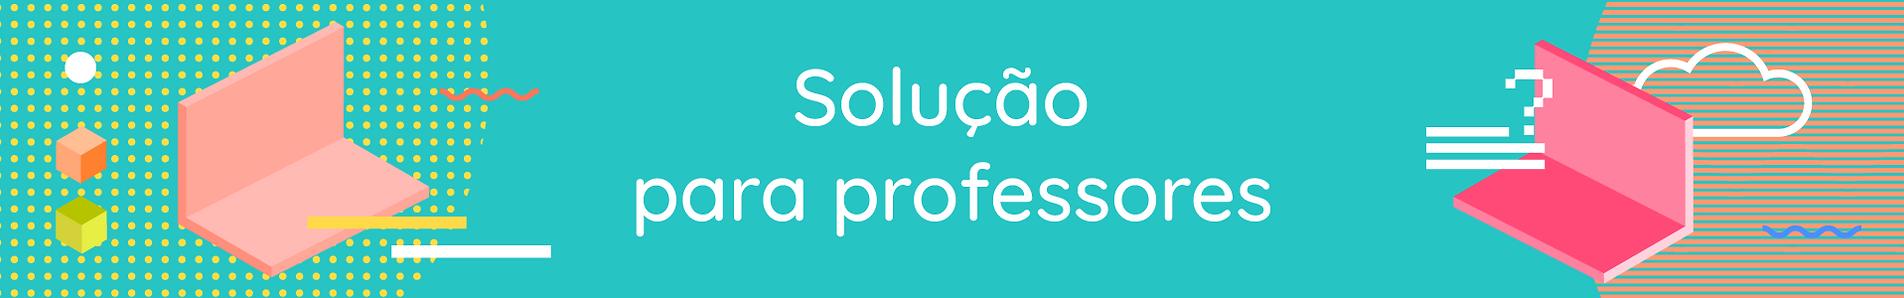 banner_professores.png